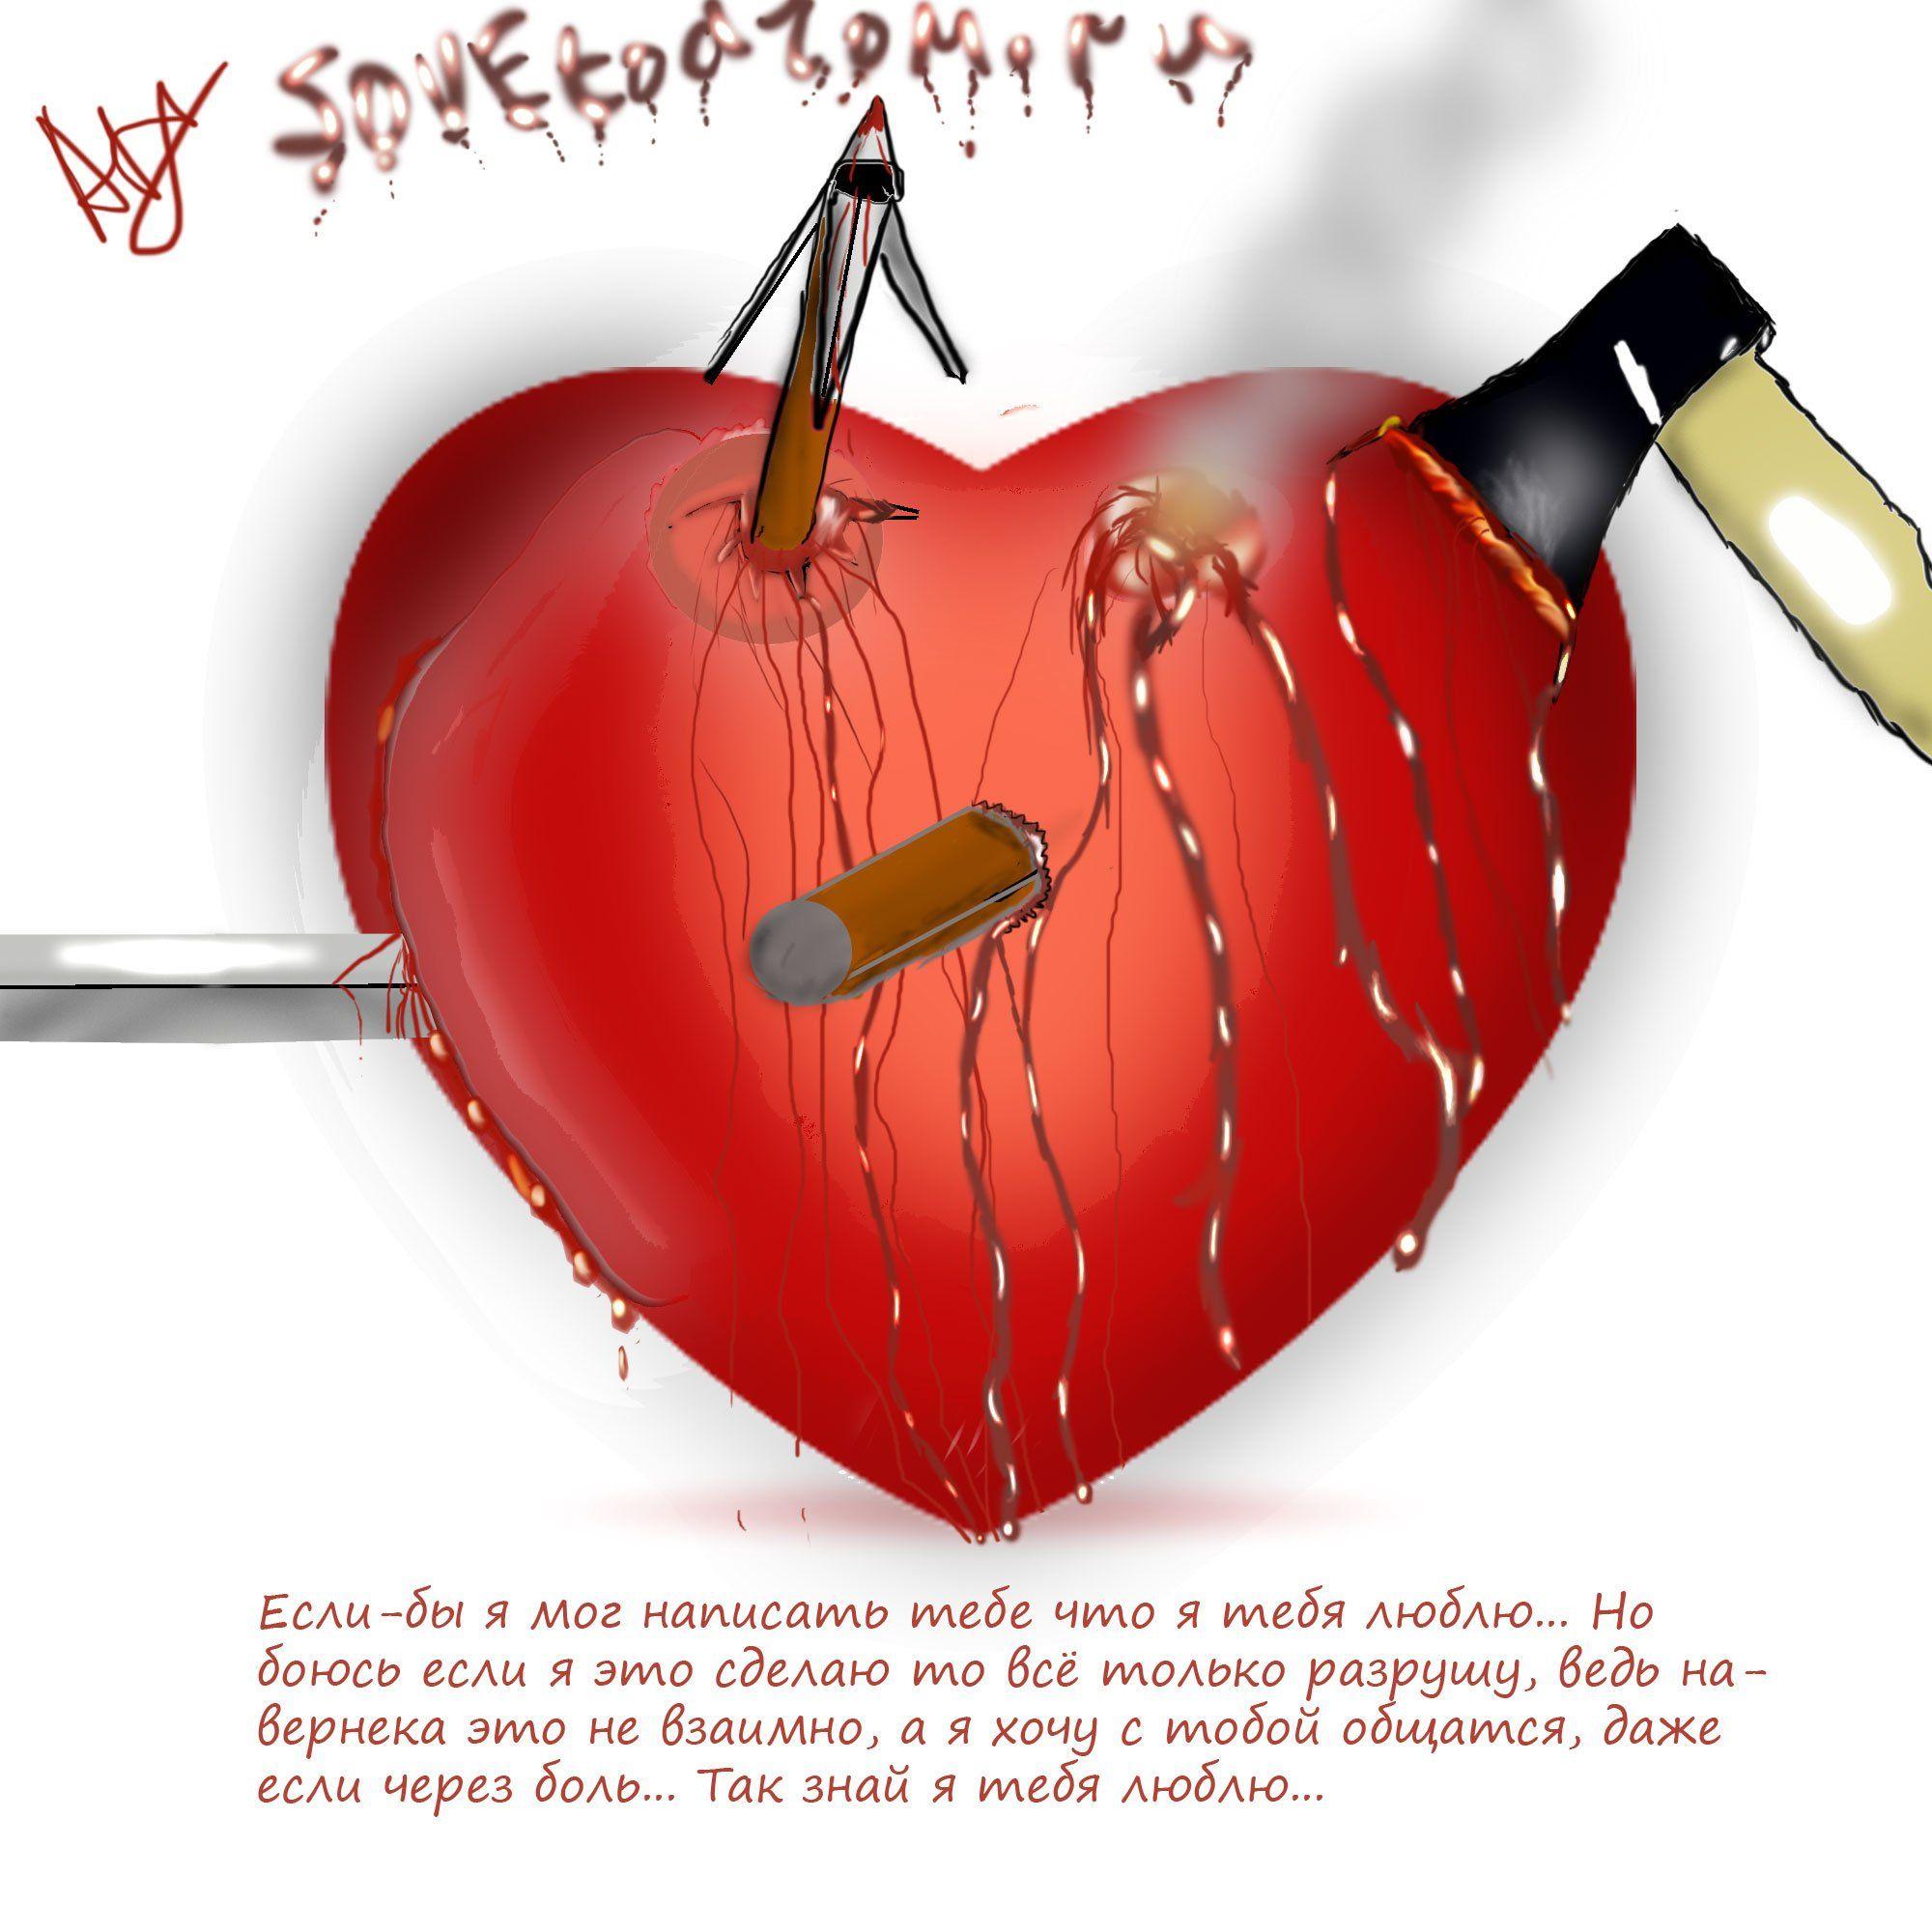 Картинки со стихами о разбитом сердце